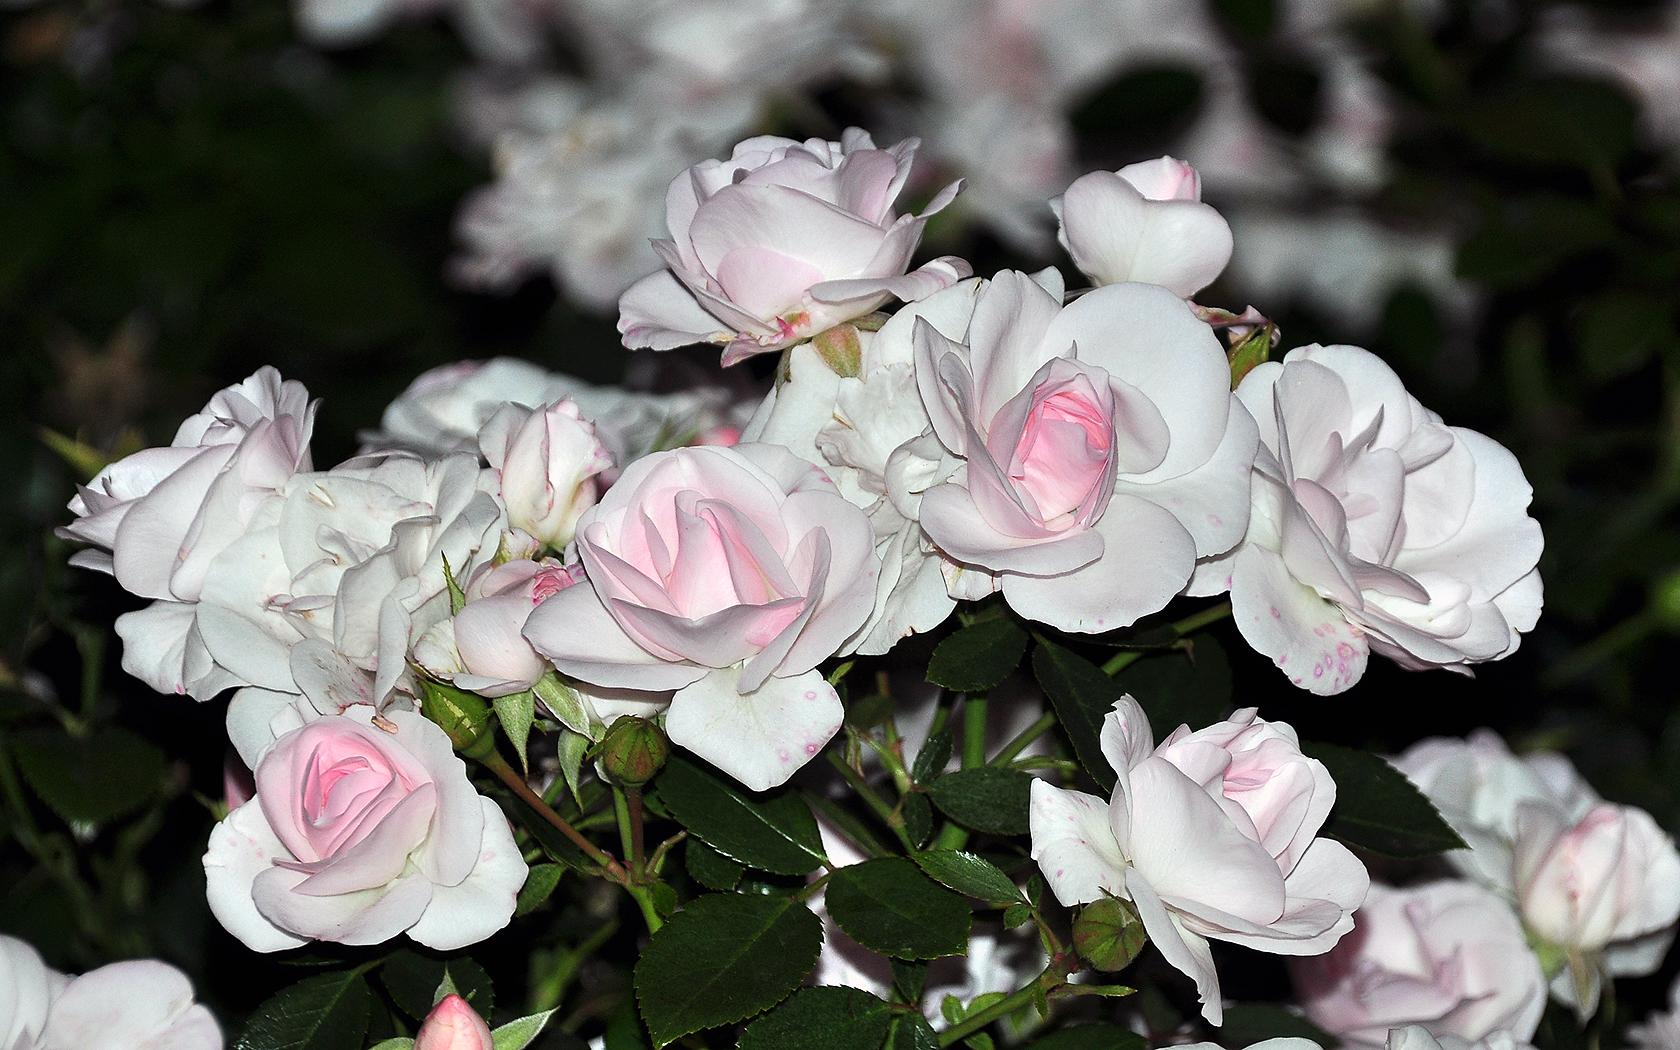 Flowers Category - Weiße Rosen Im Garten , HD Wallpaper & Backgrounds